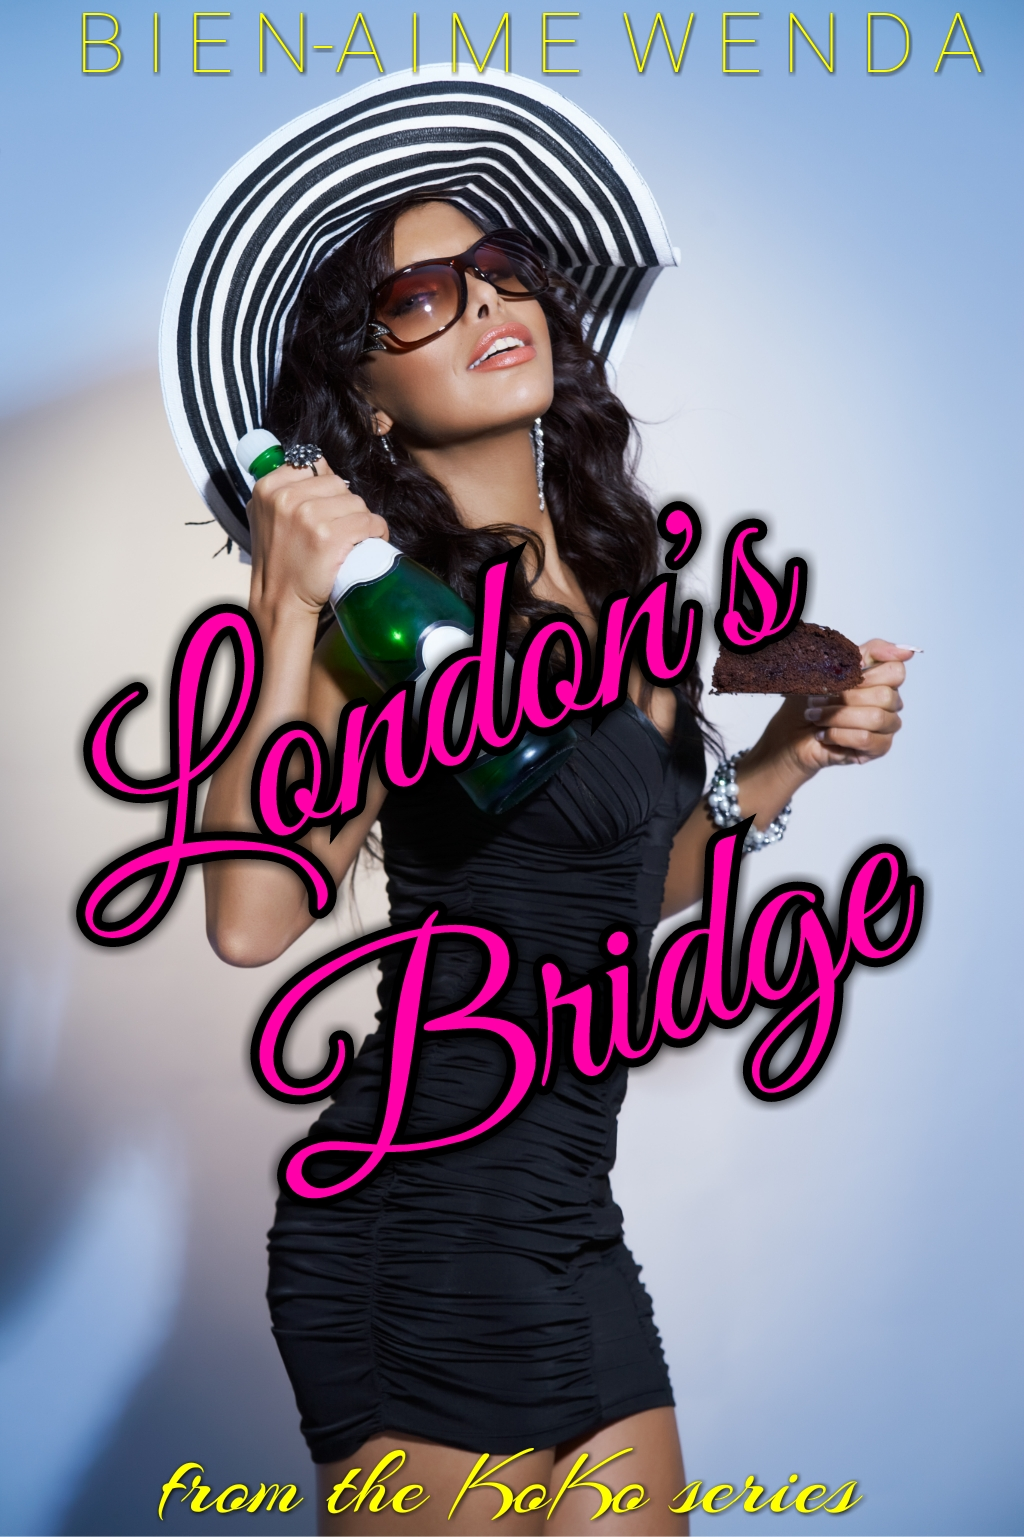 LondonsBridge